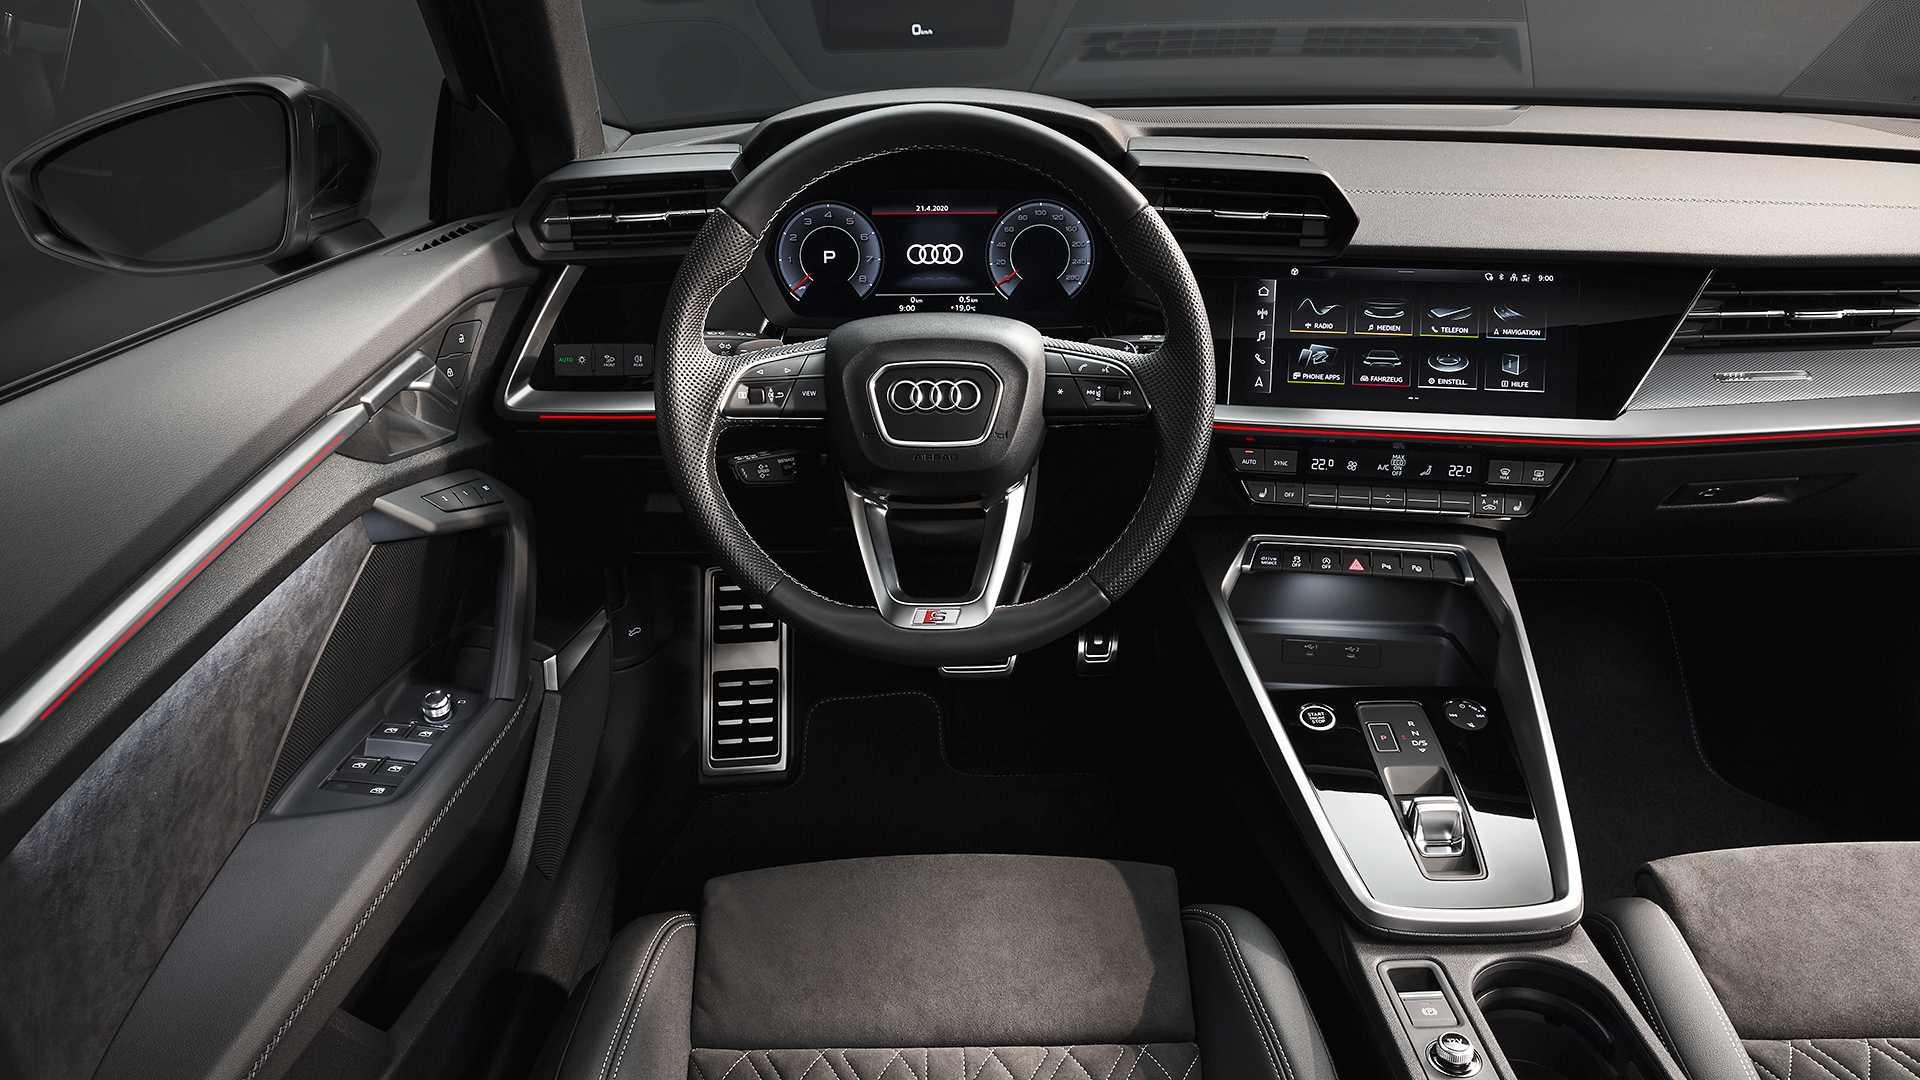 Intérieur Audi A3 Berline (2020)